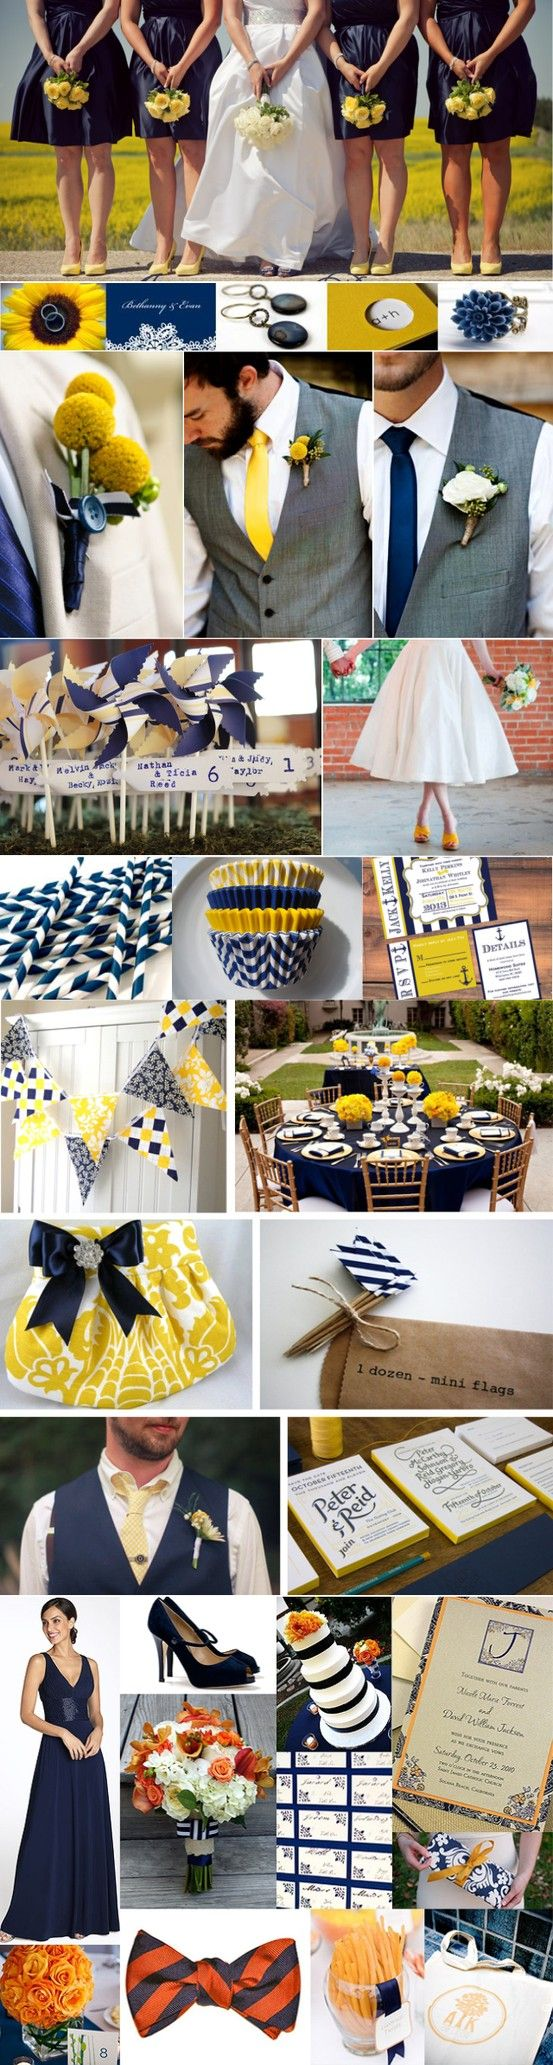 navy and yellow wedding inspiration fairy tale wedding